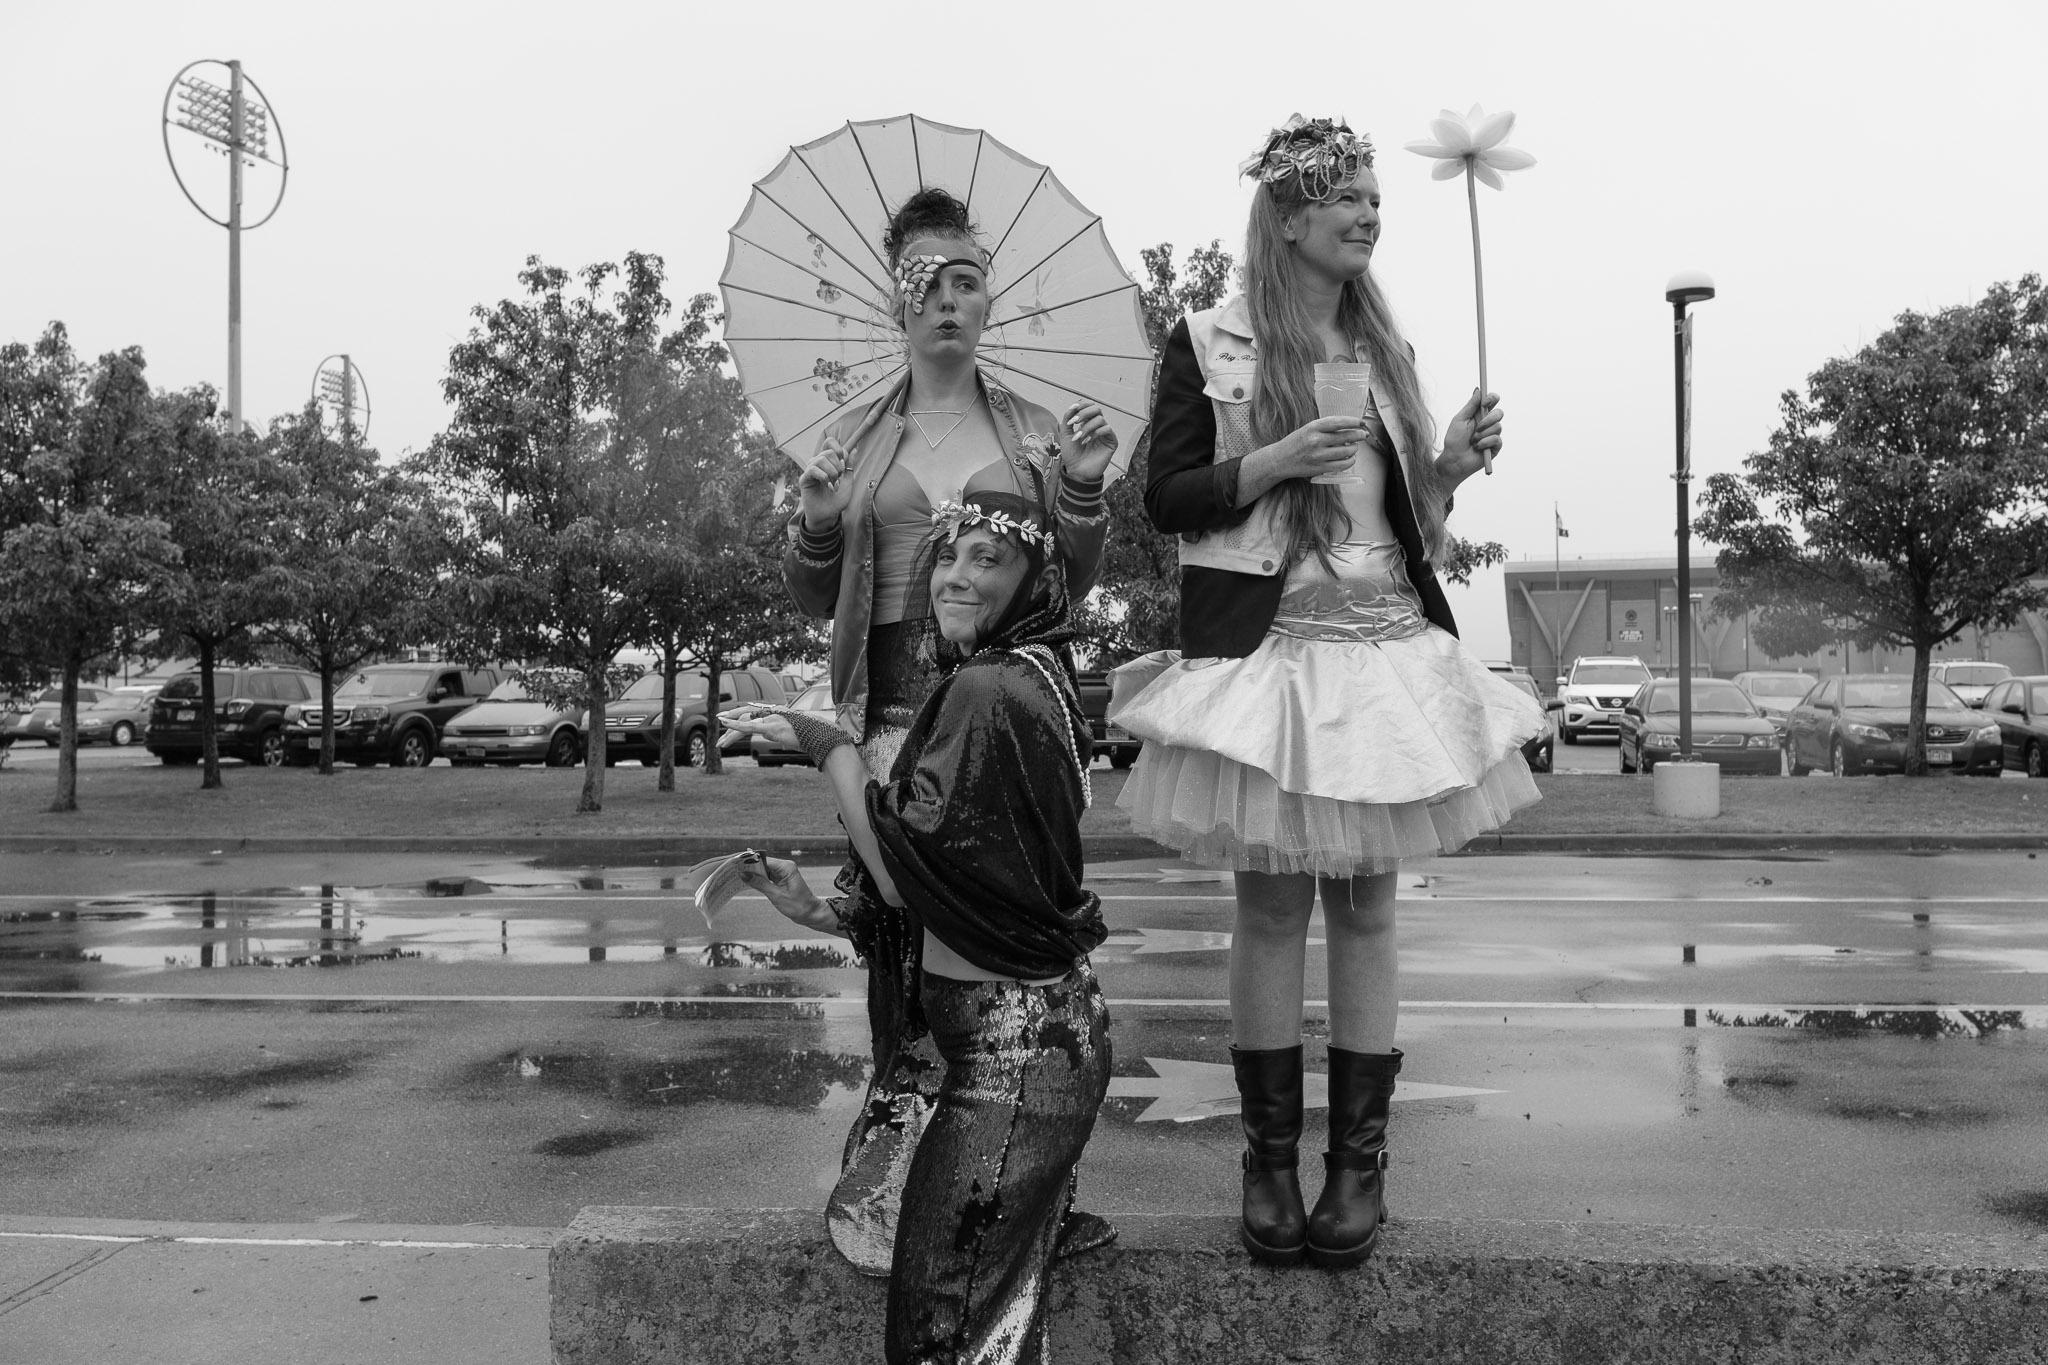 mermaidparade2017_019.jpg